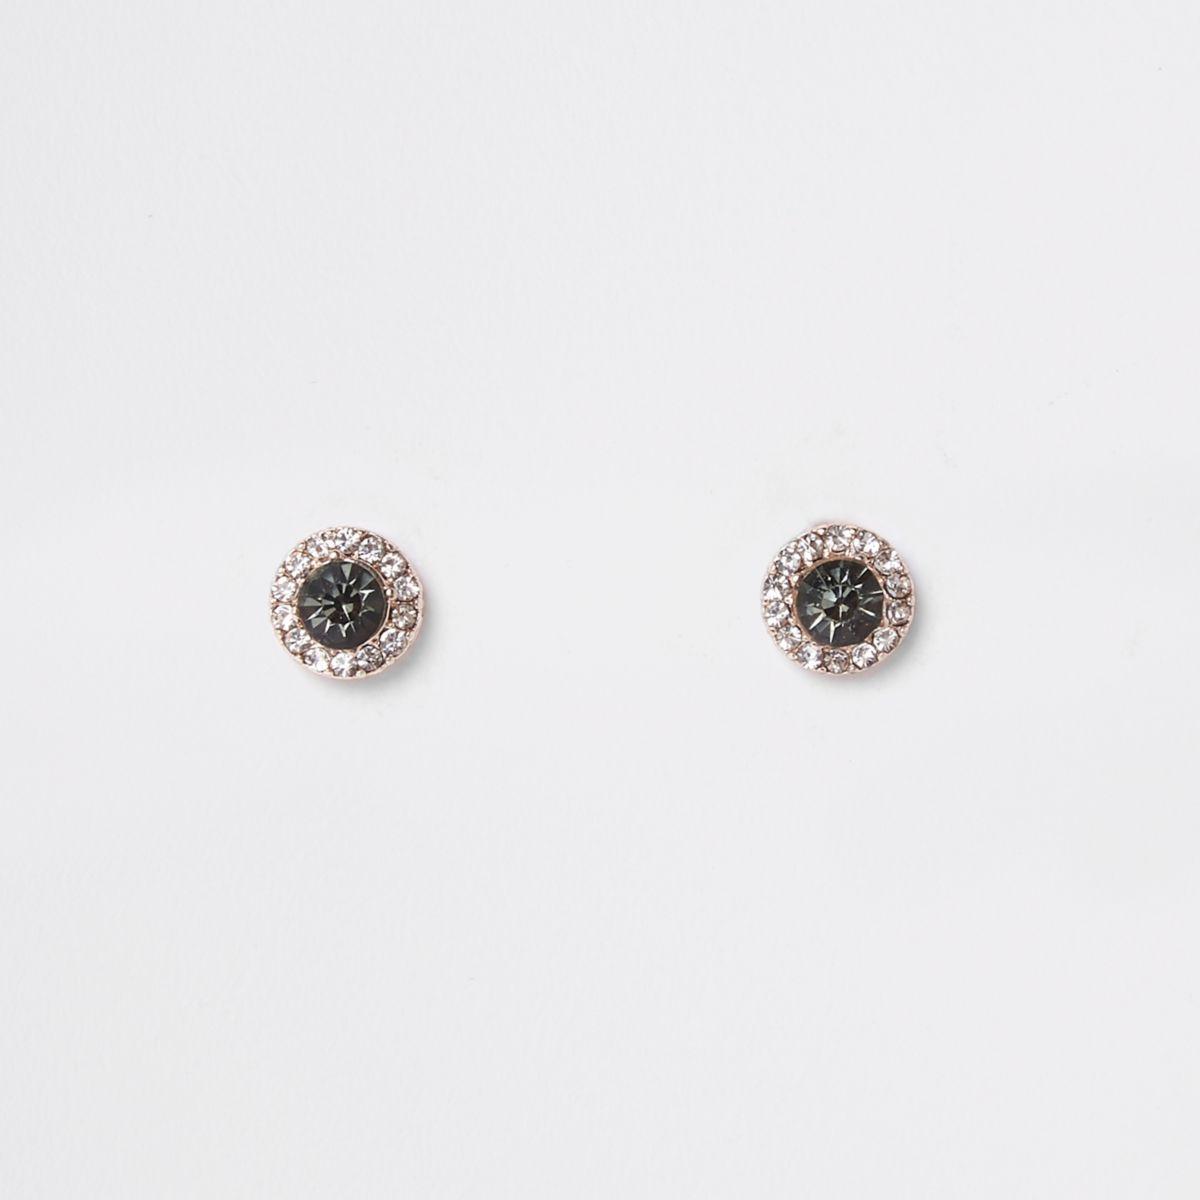 Rose gold tone smoky jewel stud earrings